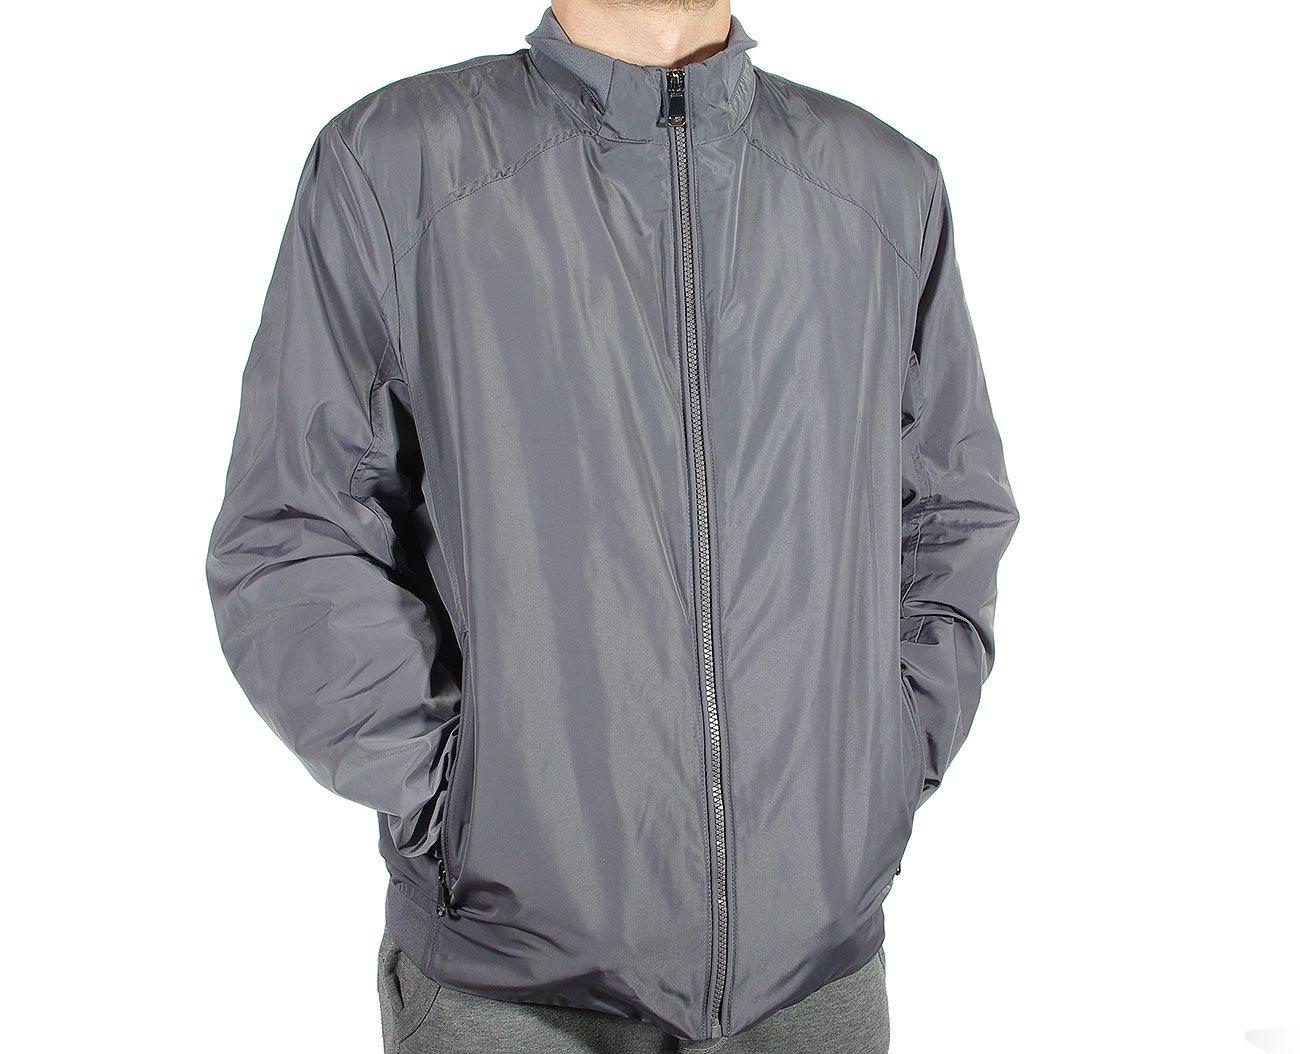 GEOX M8220U kurtka man jacket metal grey